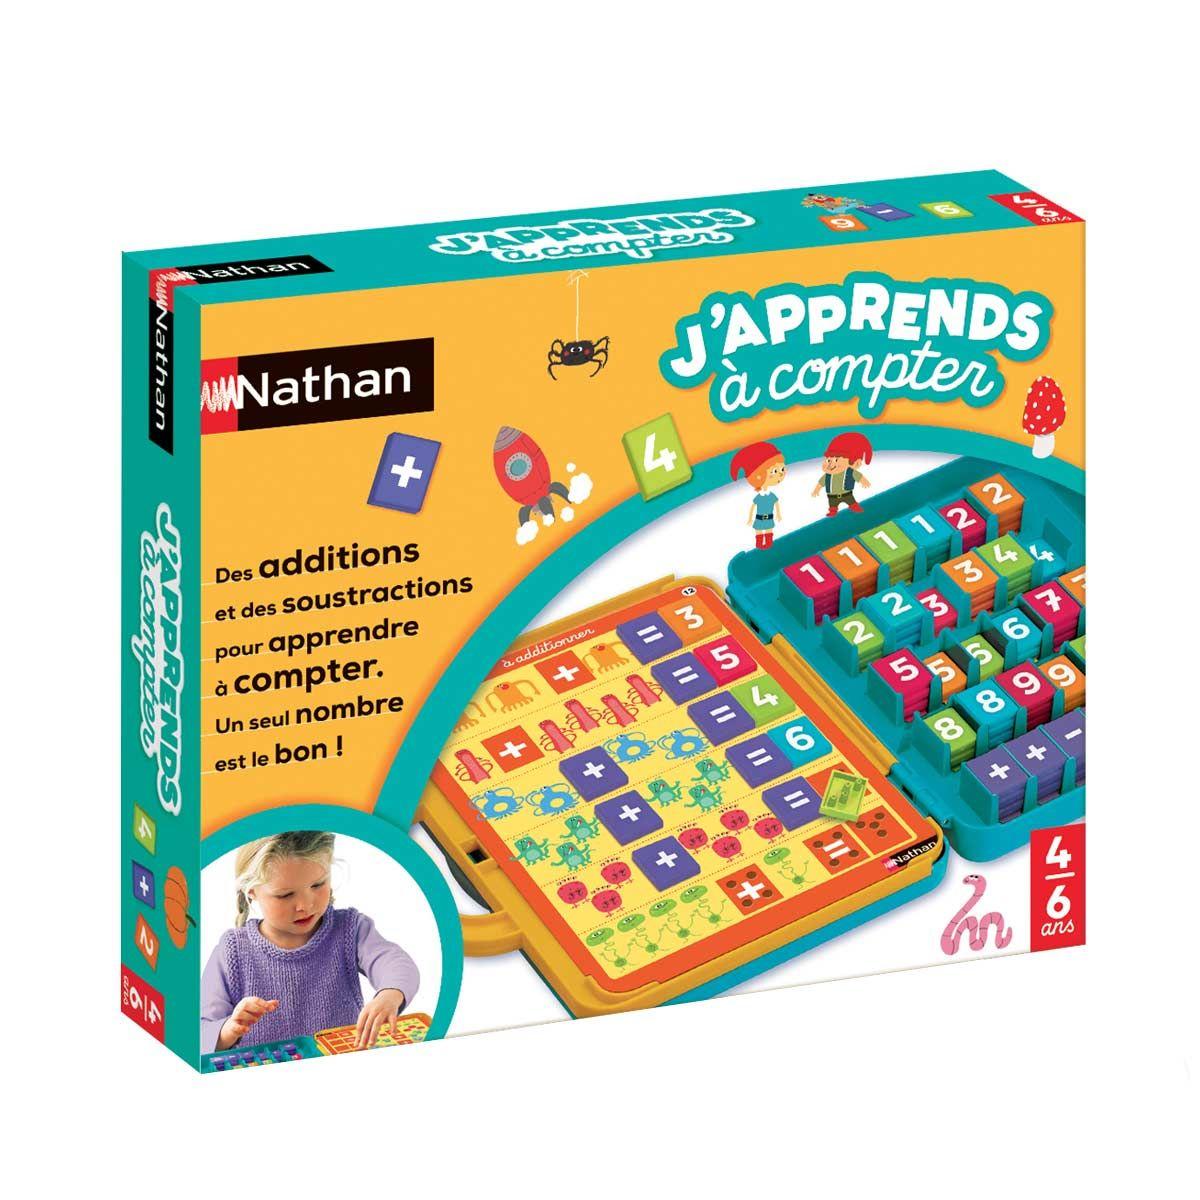 Jeu éducatif J'apprends à compter Nathan | Jeu educatif, Jeux pour apprendre et Apprendre à compter